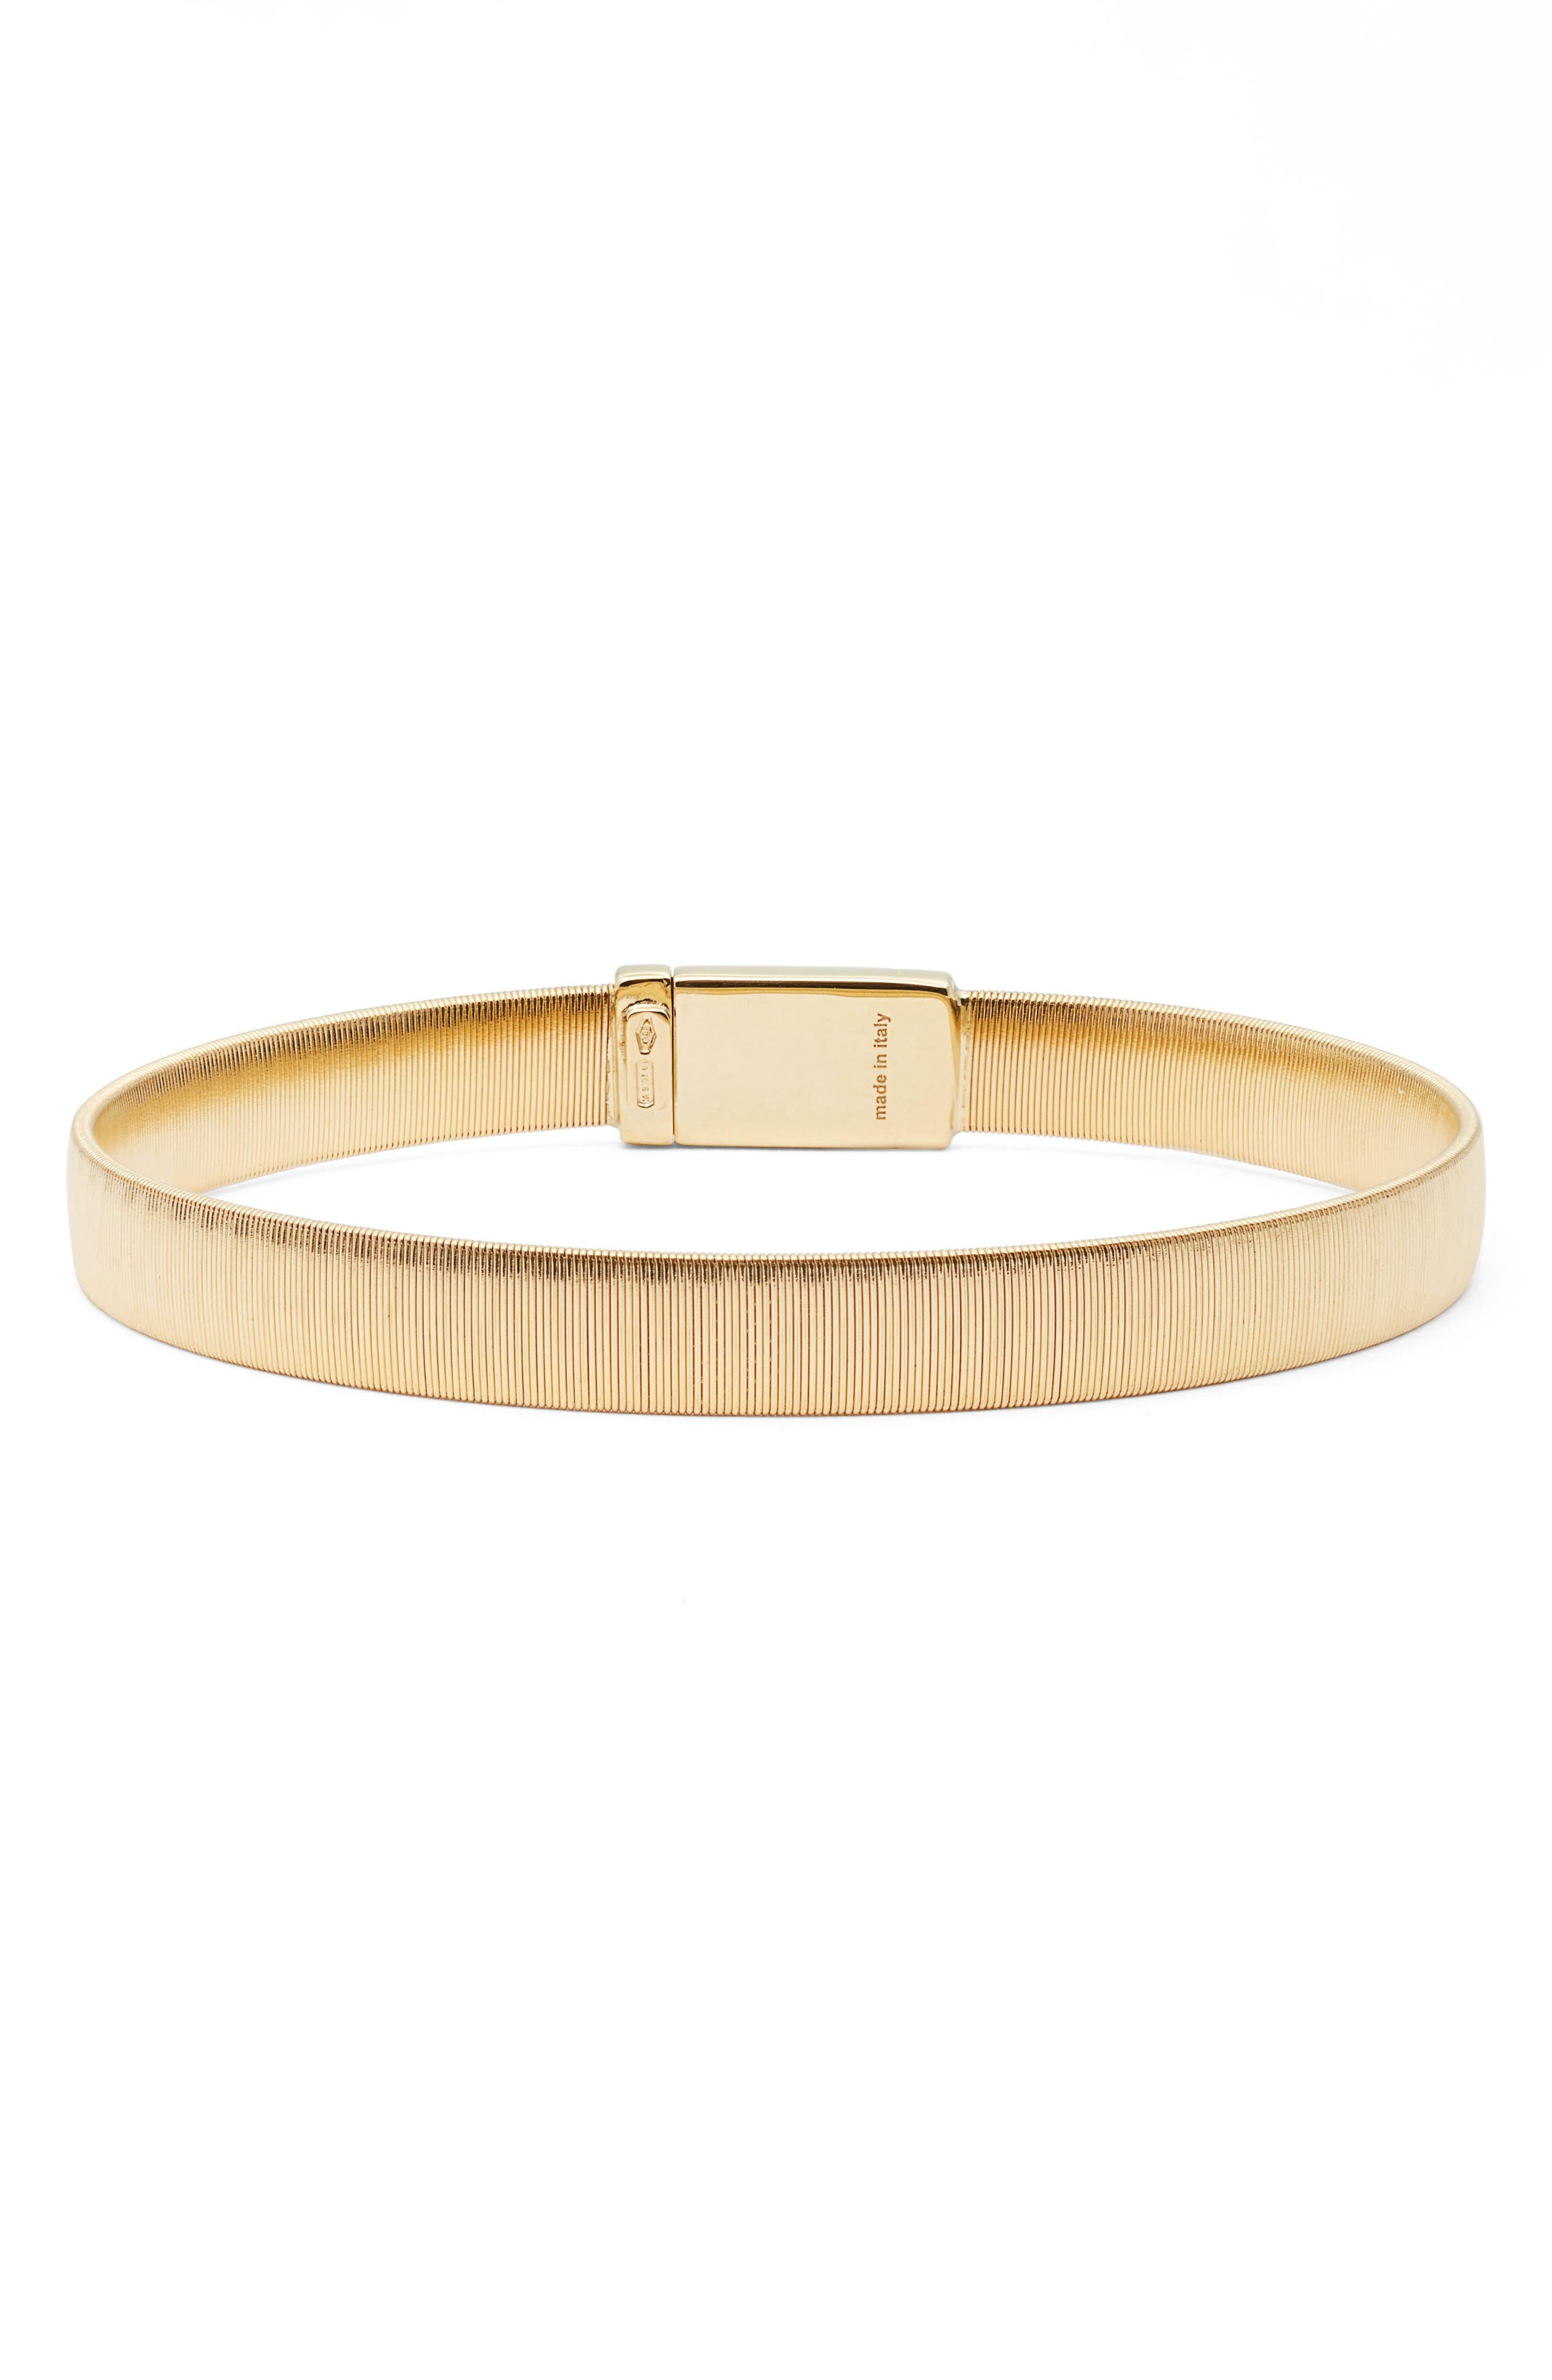 MARCO BICEGO Masai Single Coil Bracelet